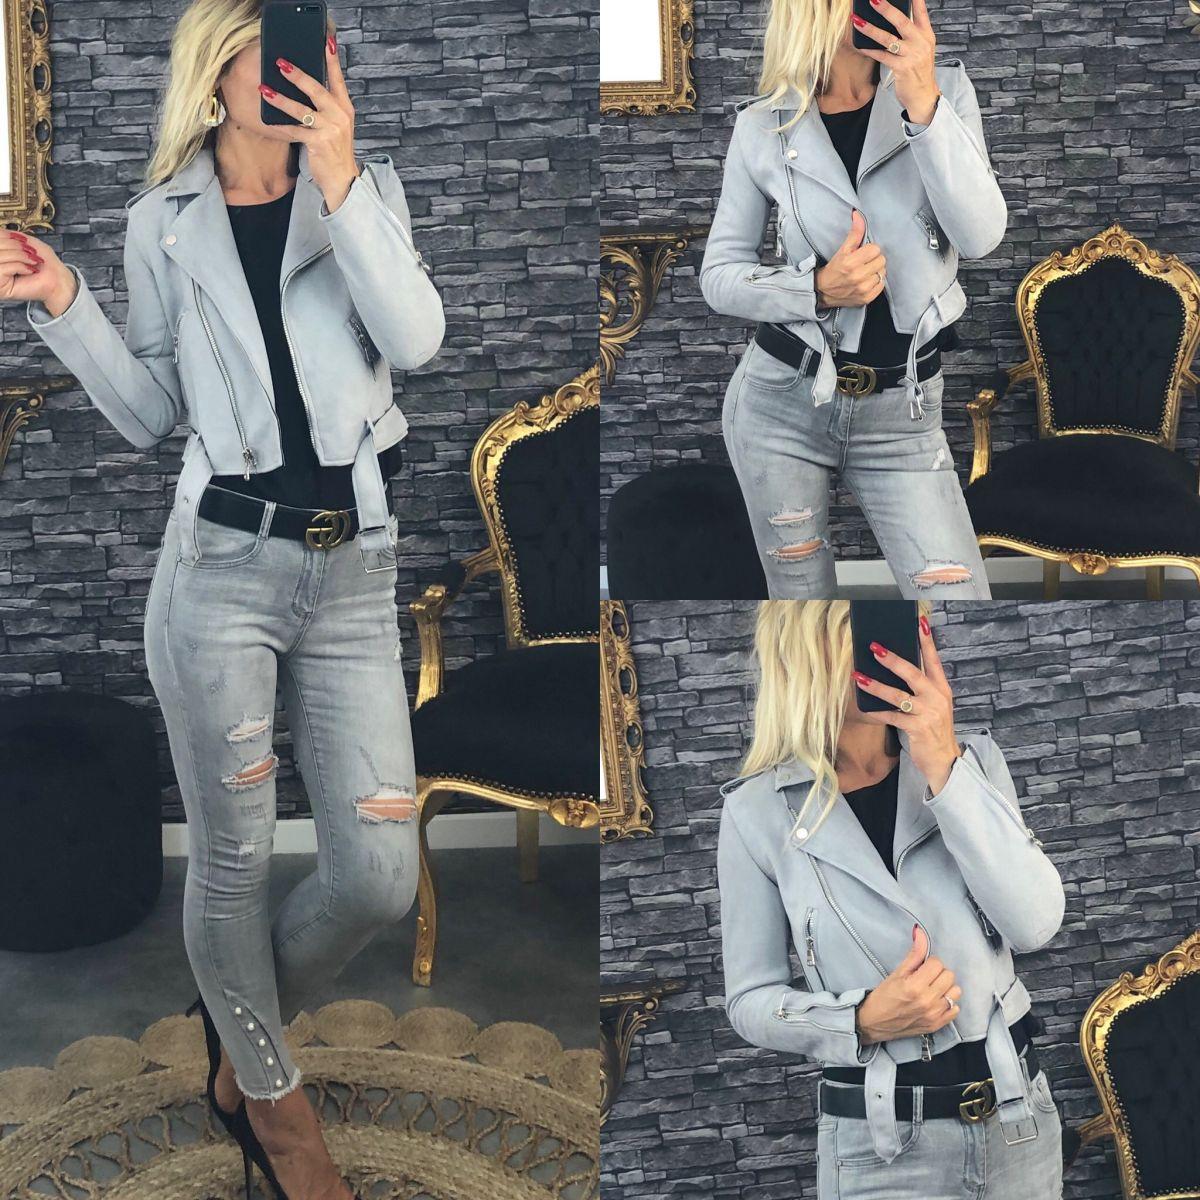 Perfecto style daim gris clair 2